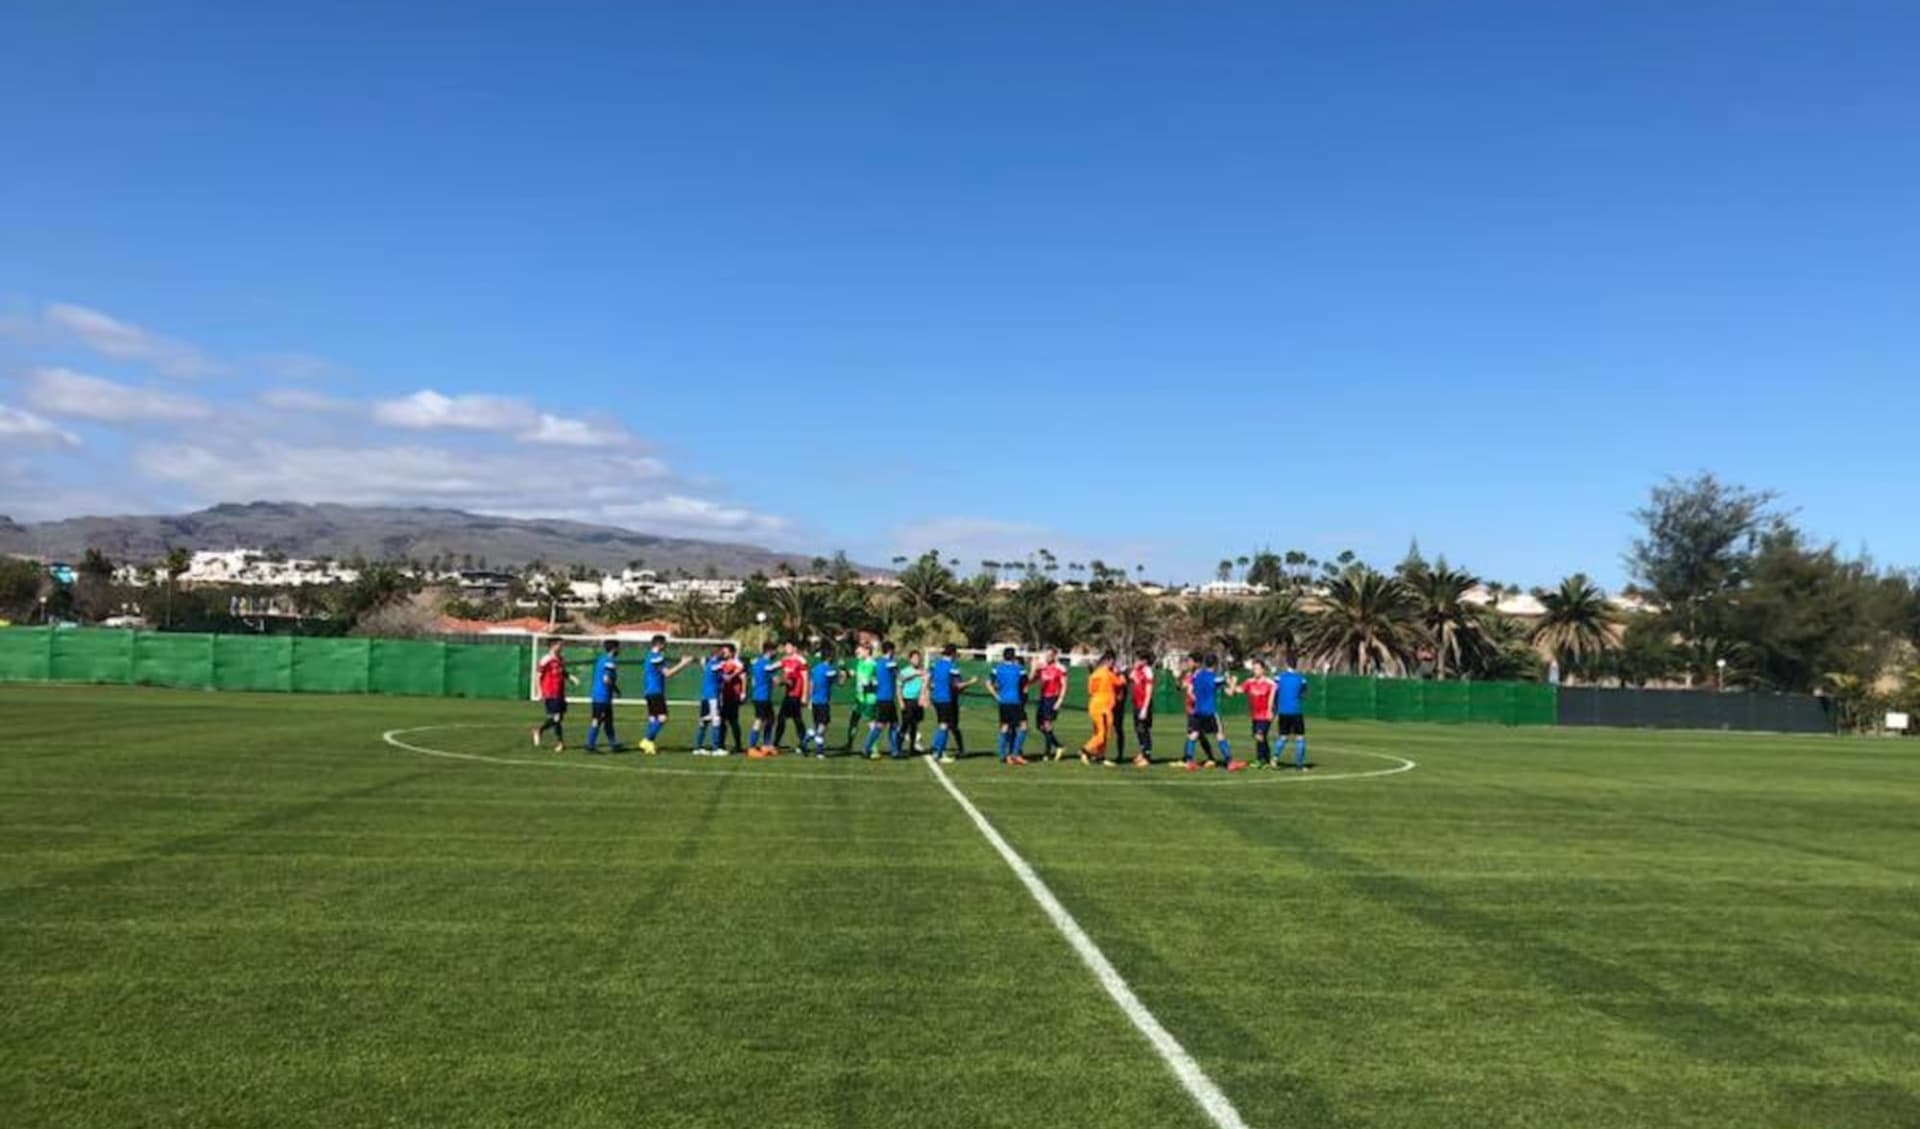 Maspalomas - Eo Maspalomas Aparthotel ab Gran Canaria: A2_maspalomas pitch 2